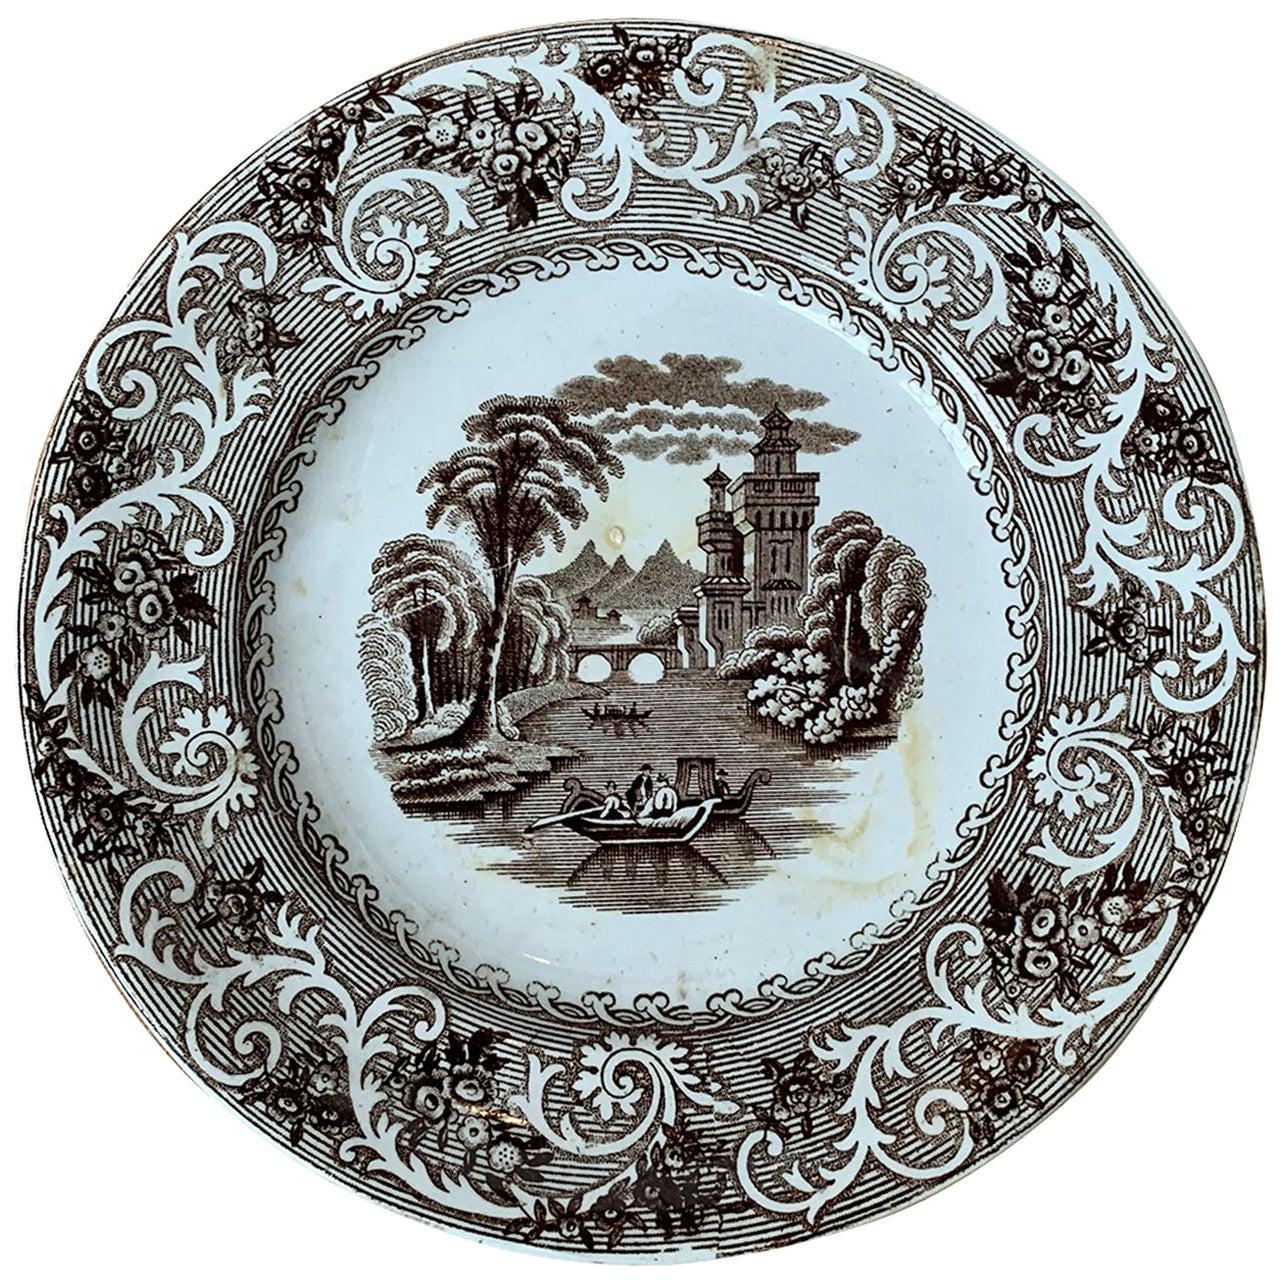 English Transferware Plate in Rhine Pattern Ironstone China Marked J.M. & S